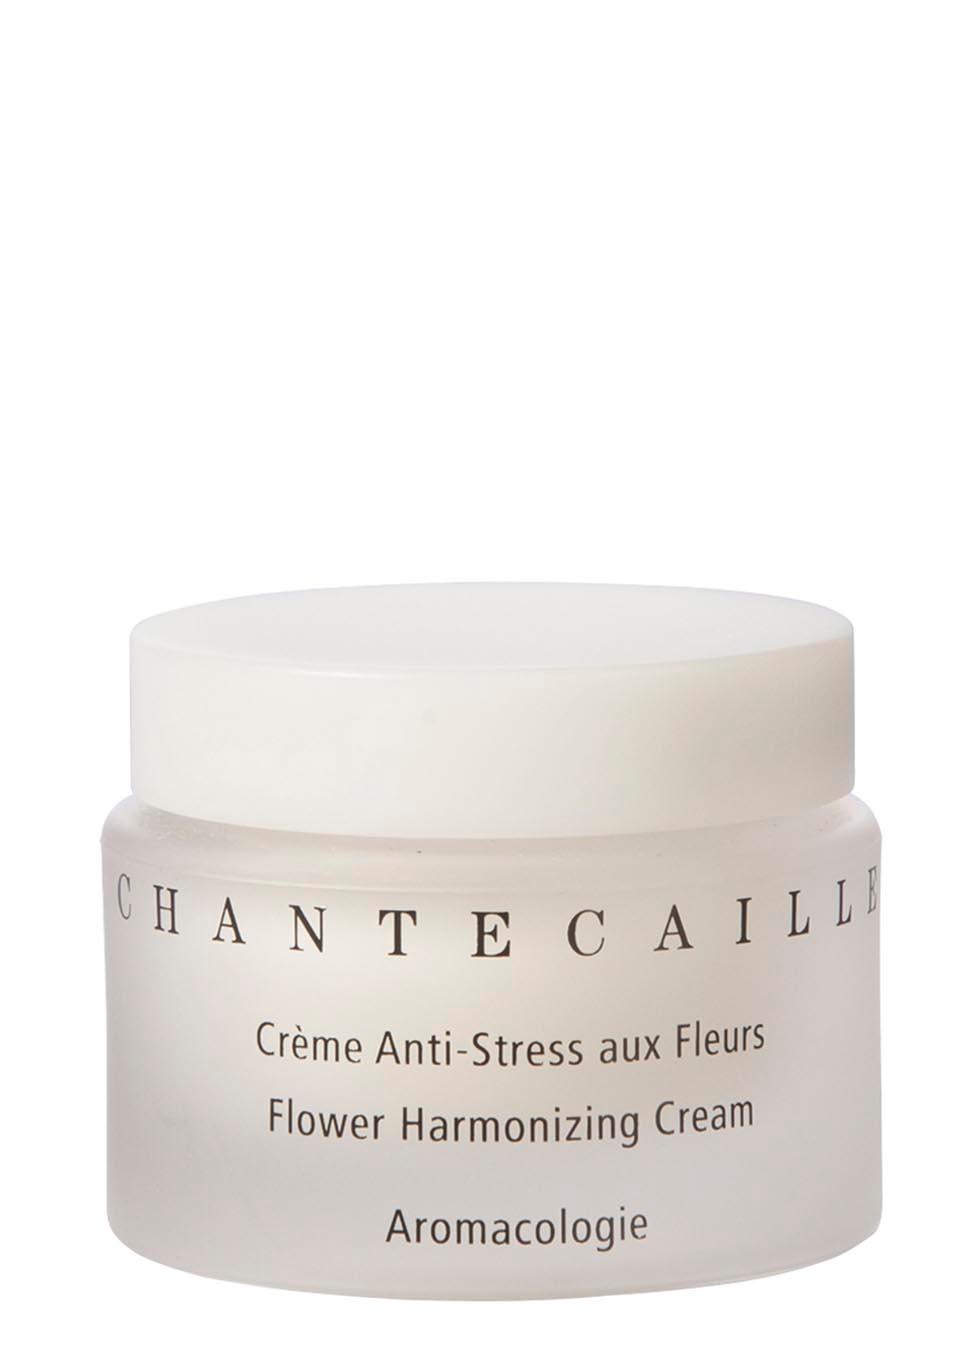 Flower Harmonizing Cream 50ml